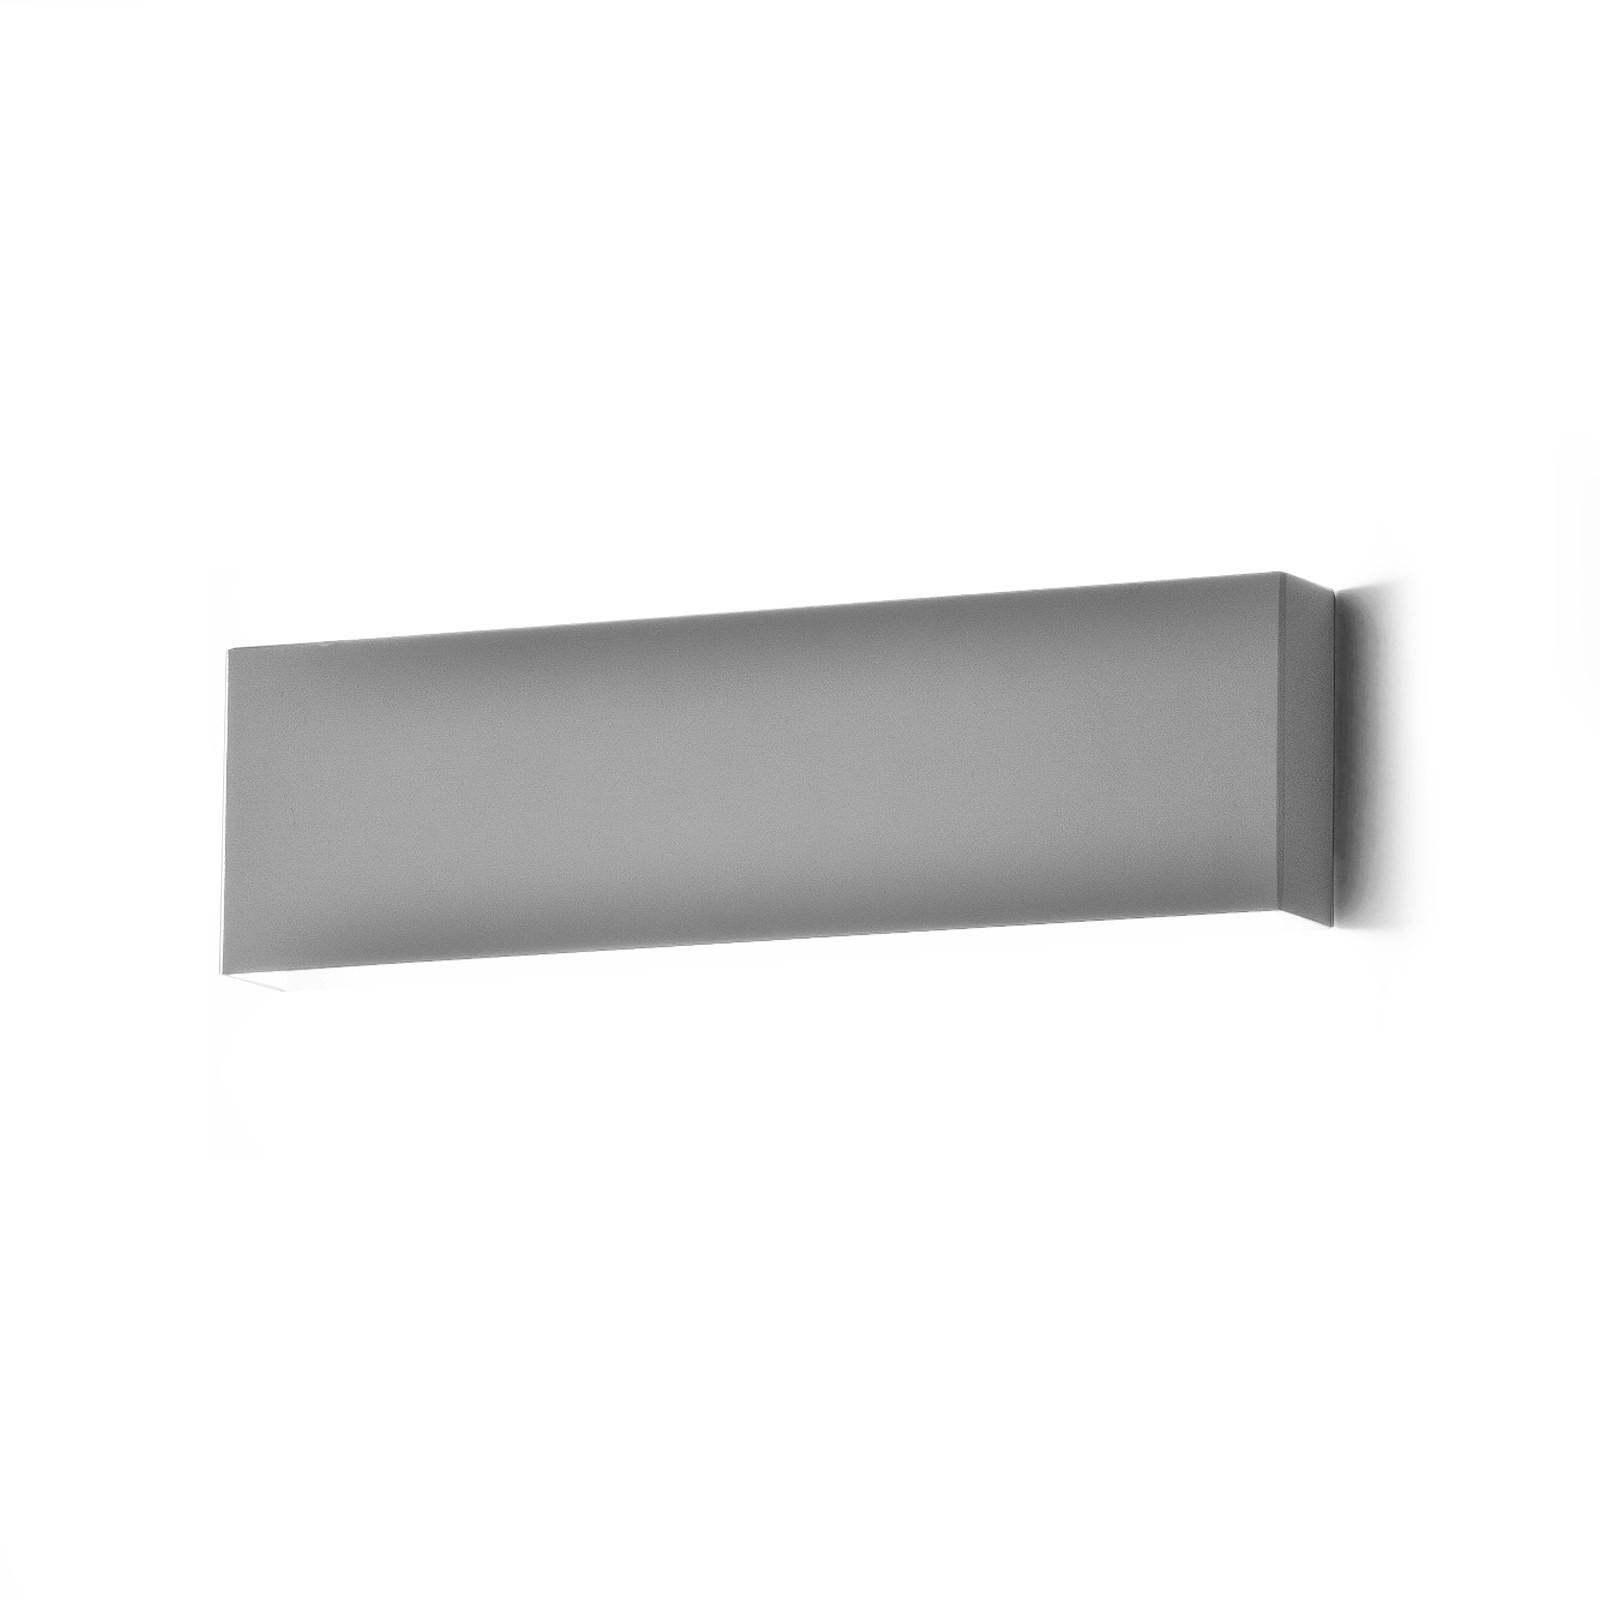 Applique lampada da parete a led moderno luce calda bianco - Meglio luce calda o fredda in cucina ...